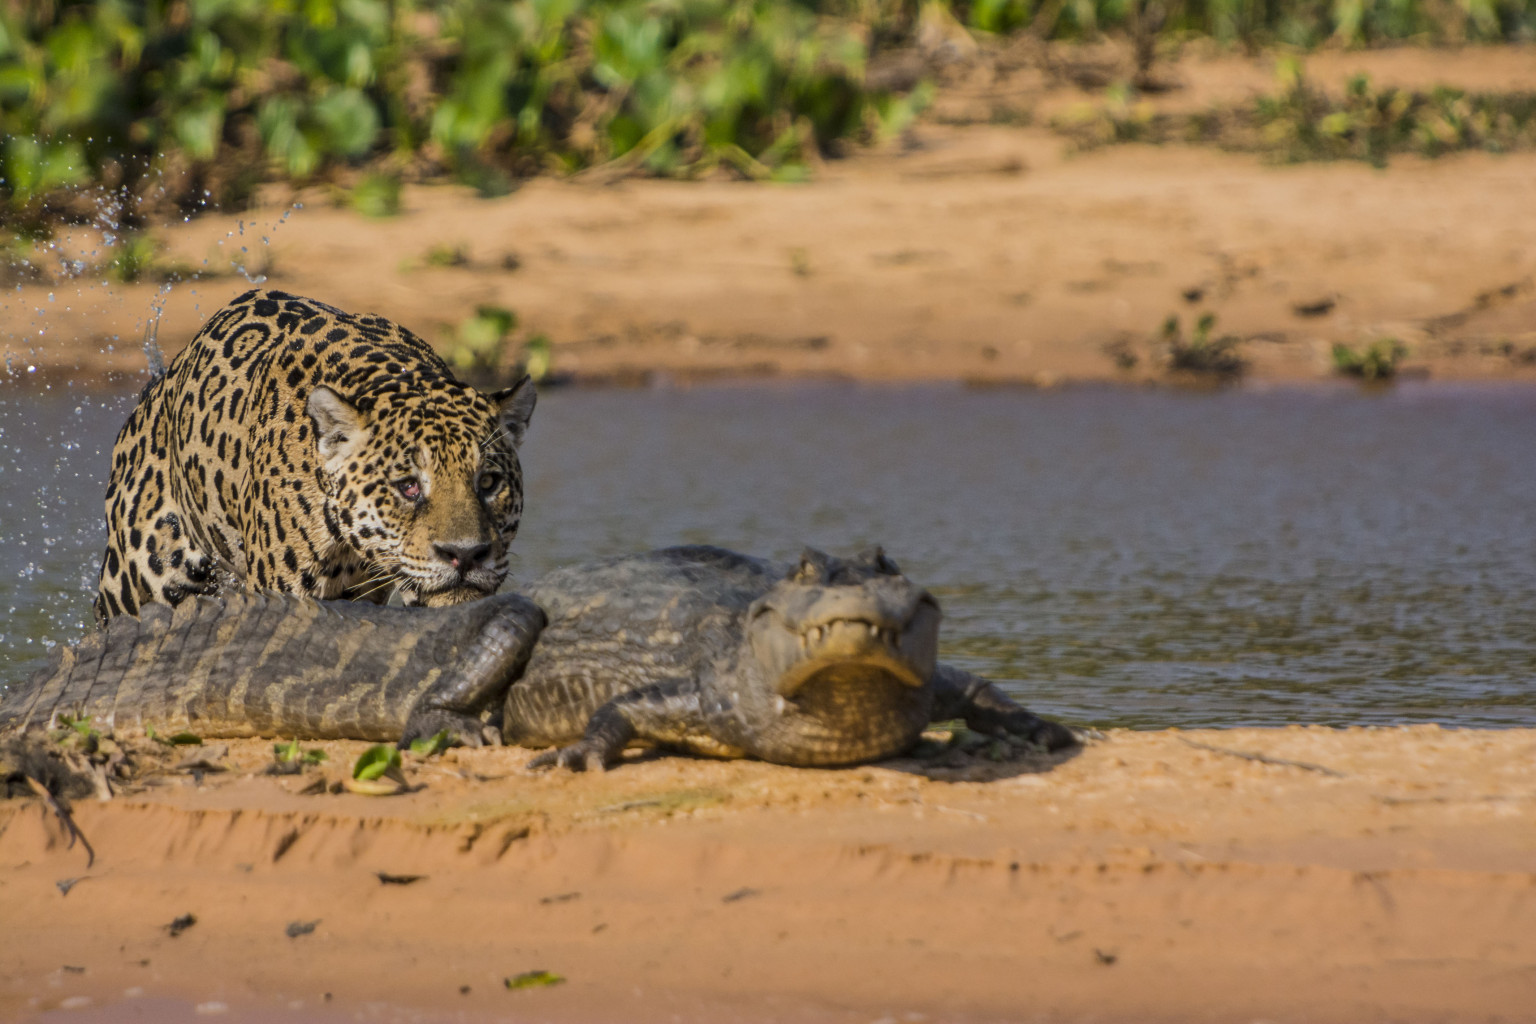 PHOTOS: Jaguar Meets Caiman In Predatory Fight